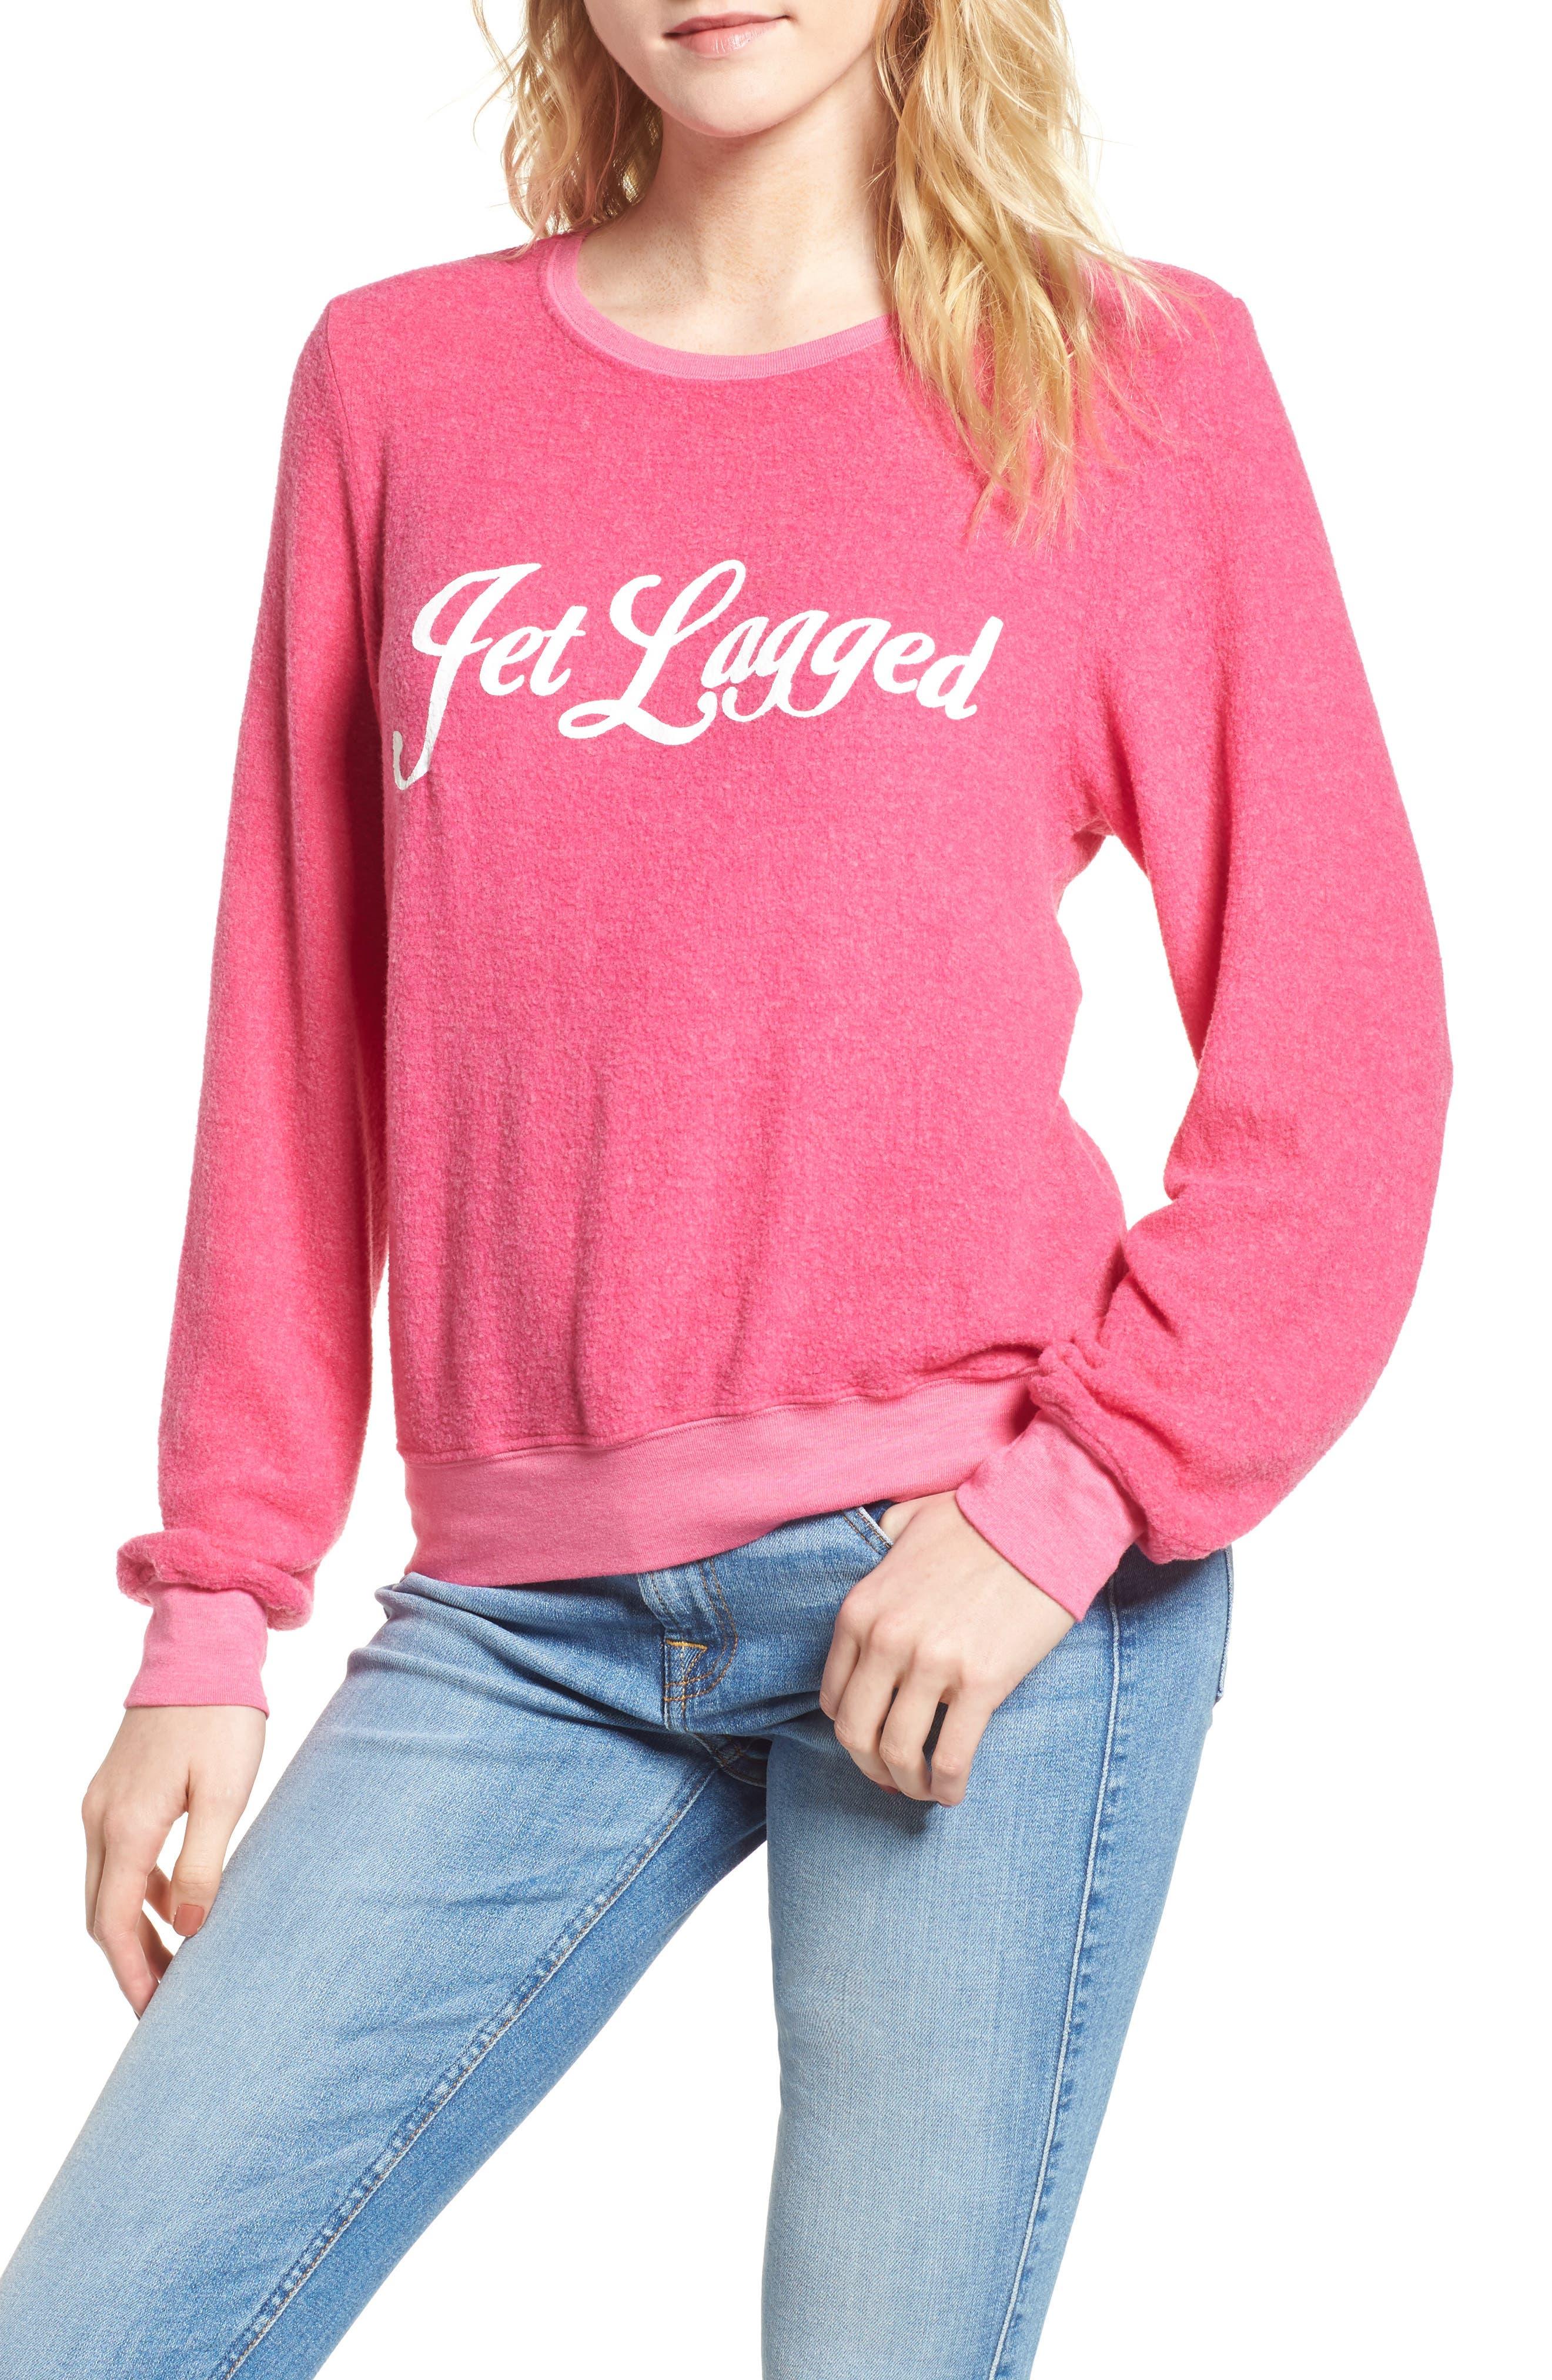 Jet Lagged Sweatshirt,                         Main,                         color,